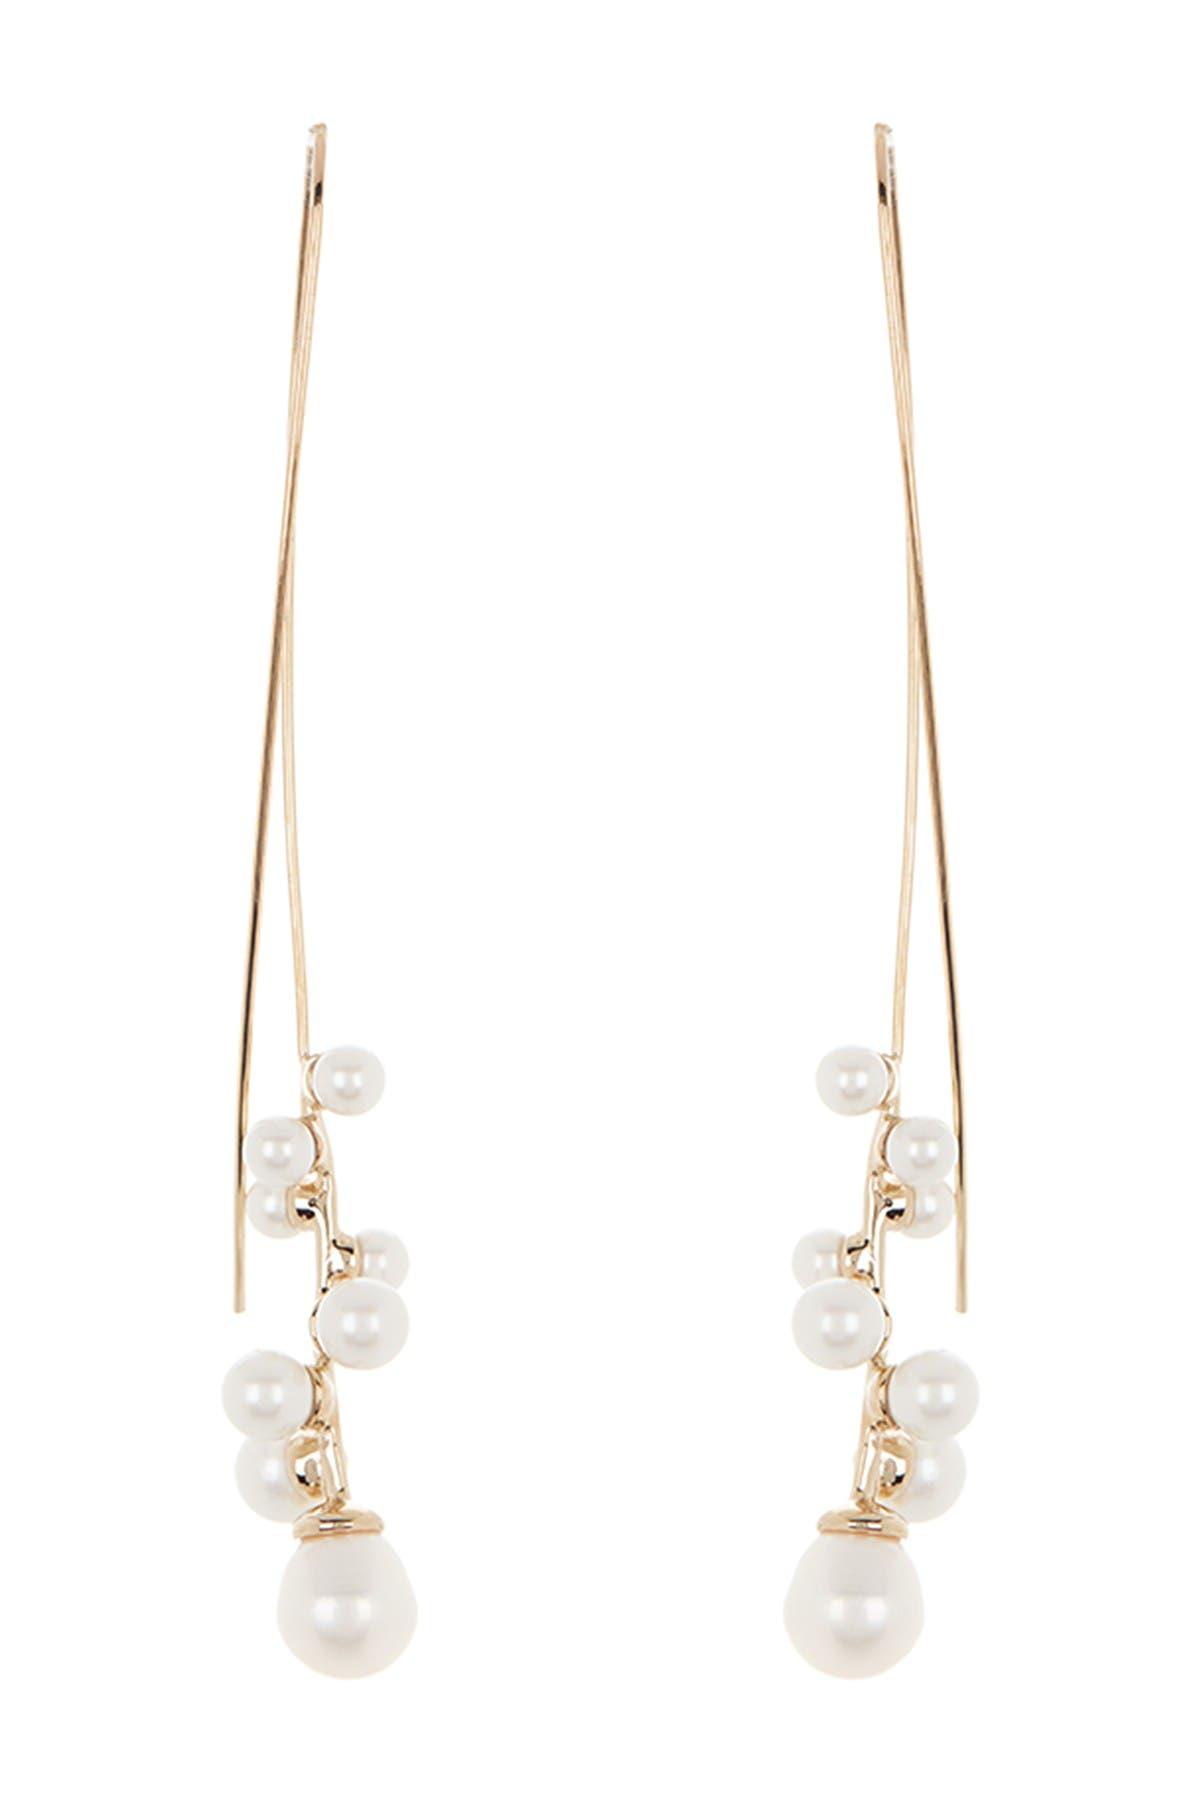 Image of Carolee Spiral Freshwater Pearl Threader Earrings